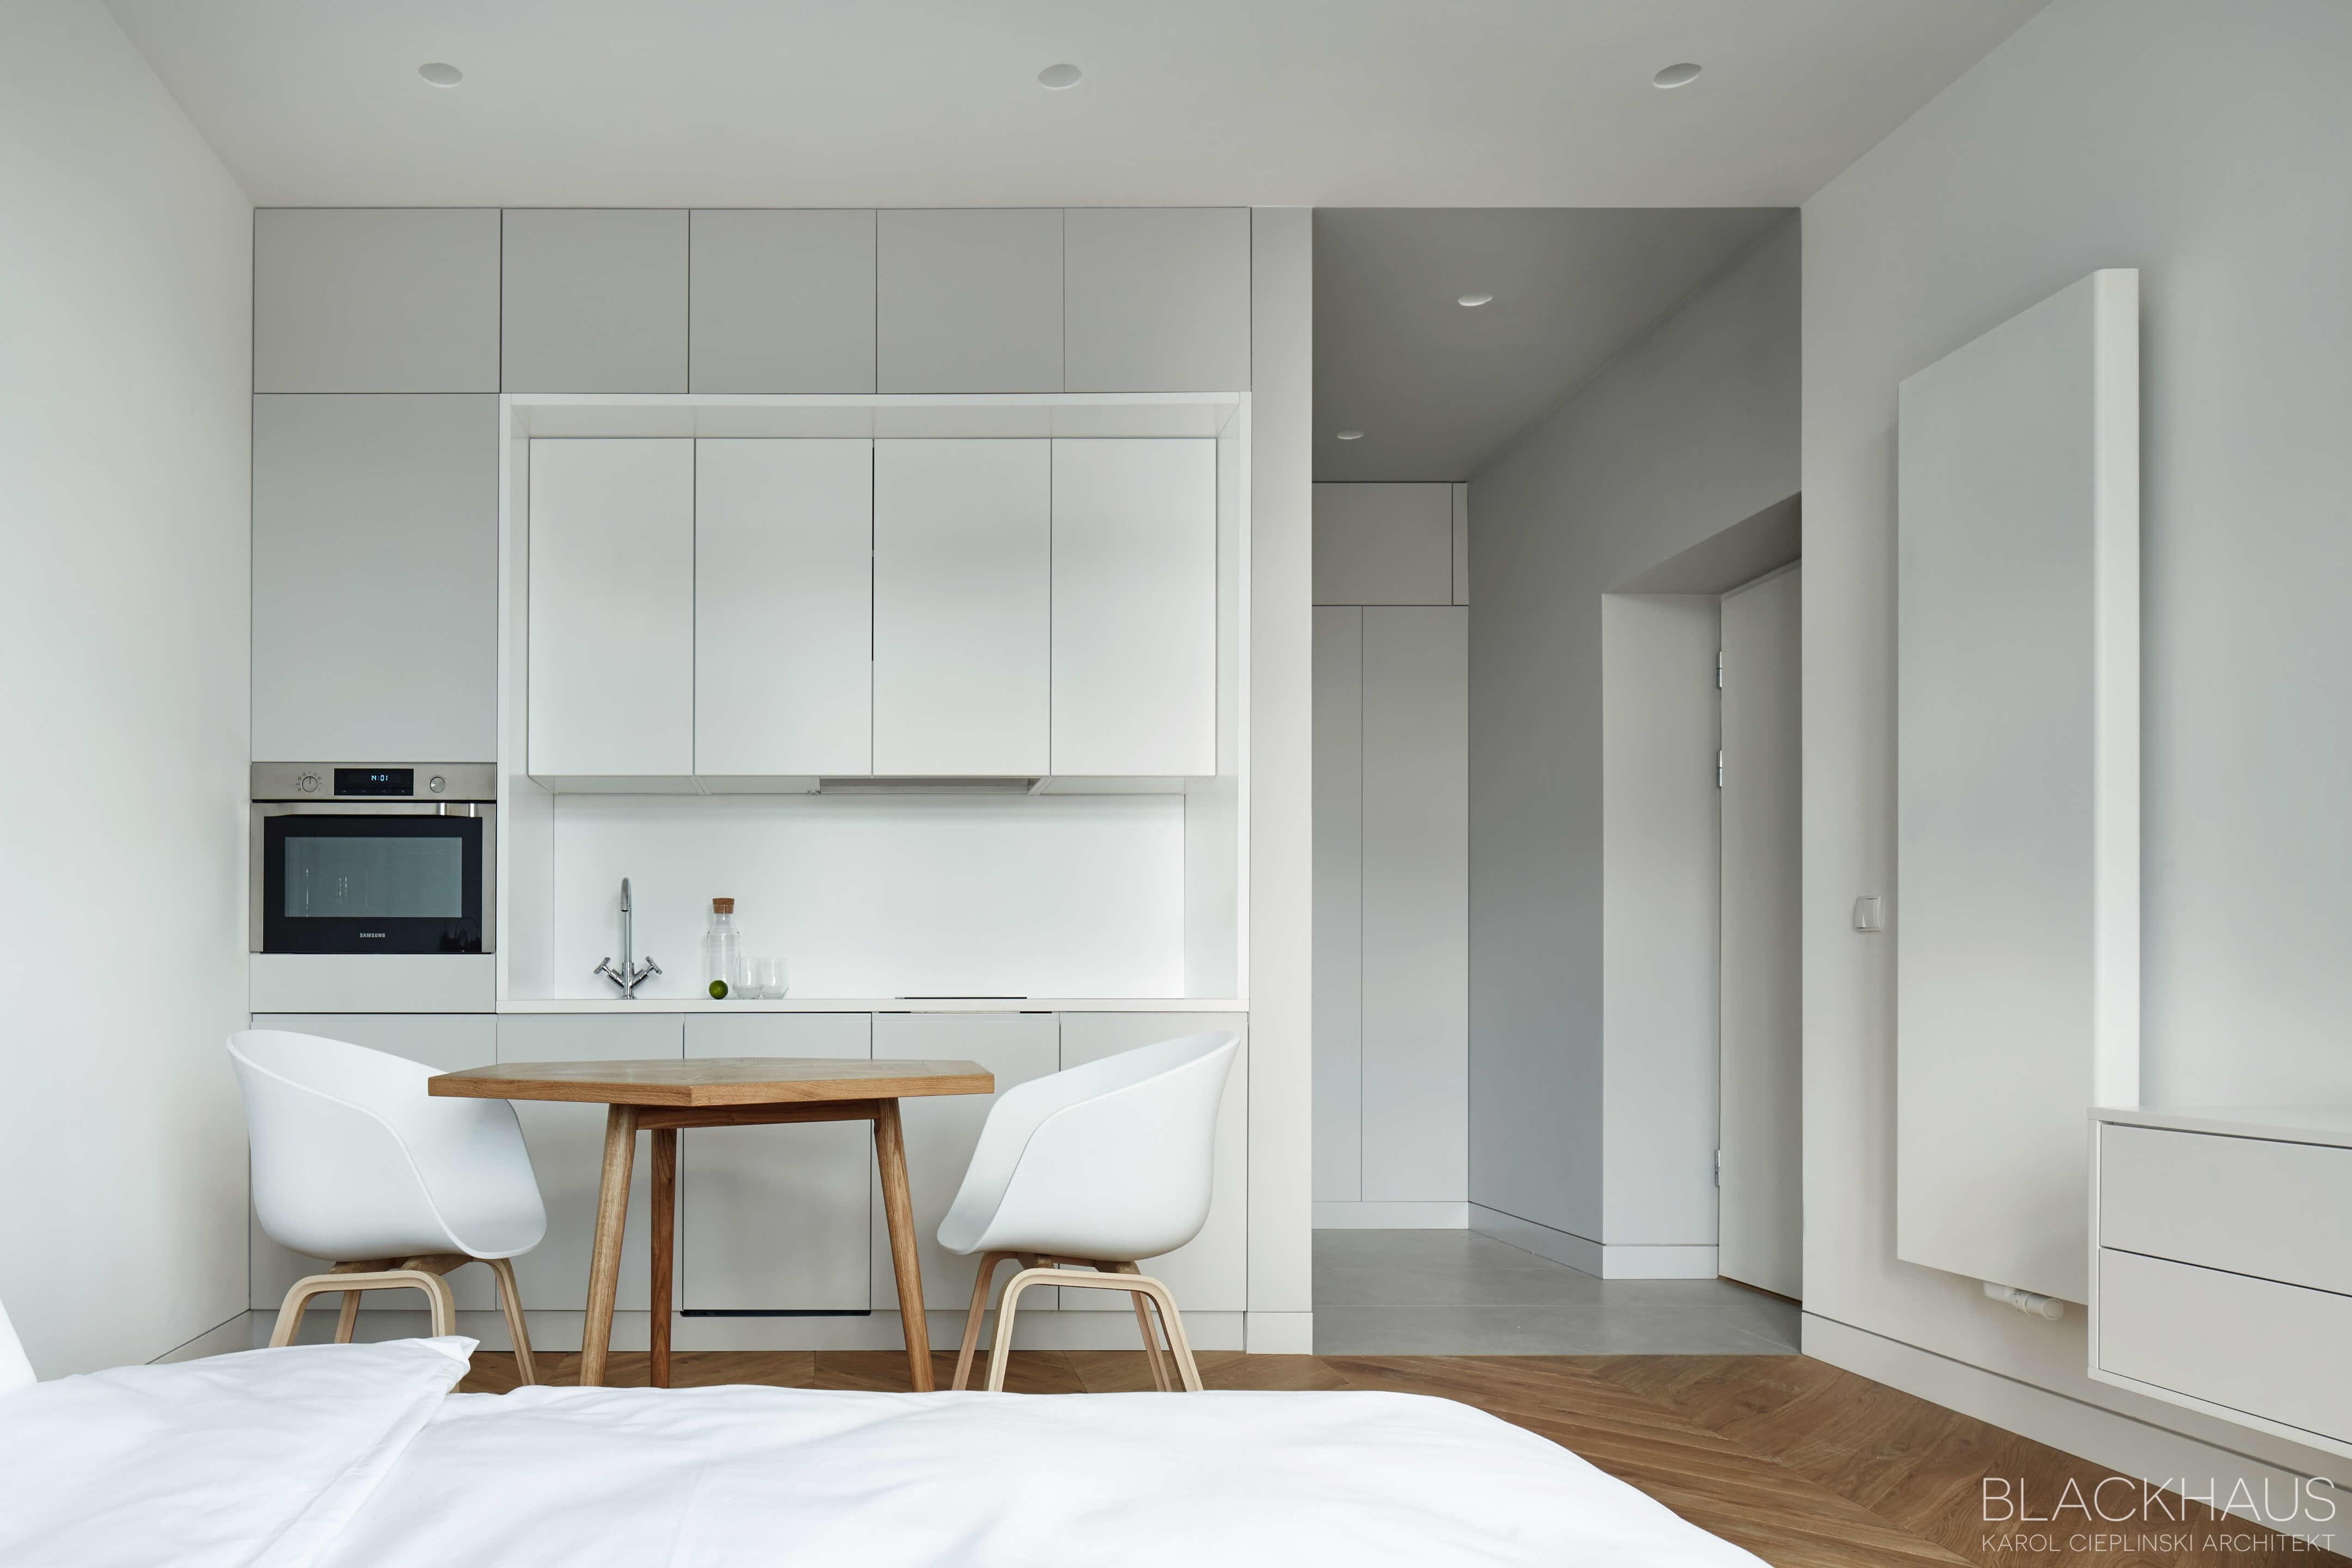 006-daniel-apartment-blackhaus